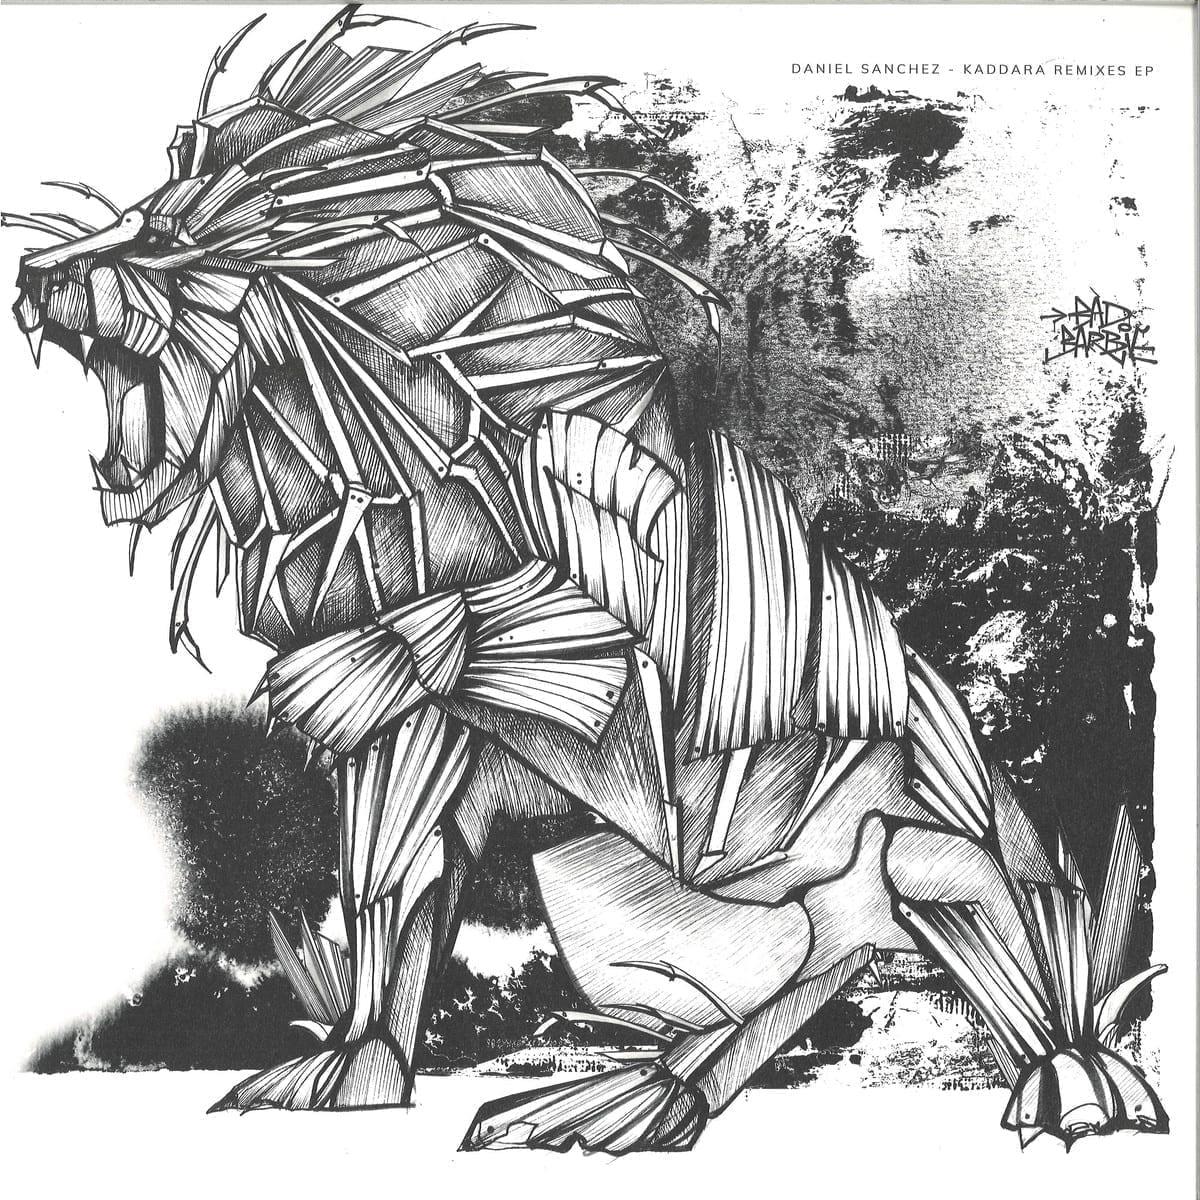 Daniel Sanchez - Kaddara Remixes EP [Bad Barbie Records] 01